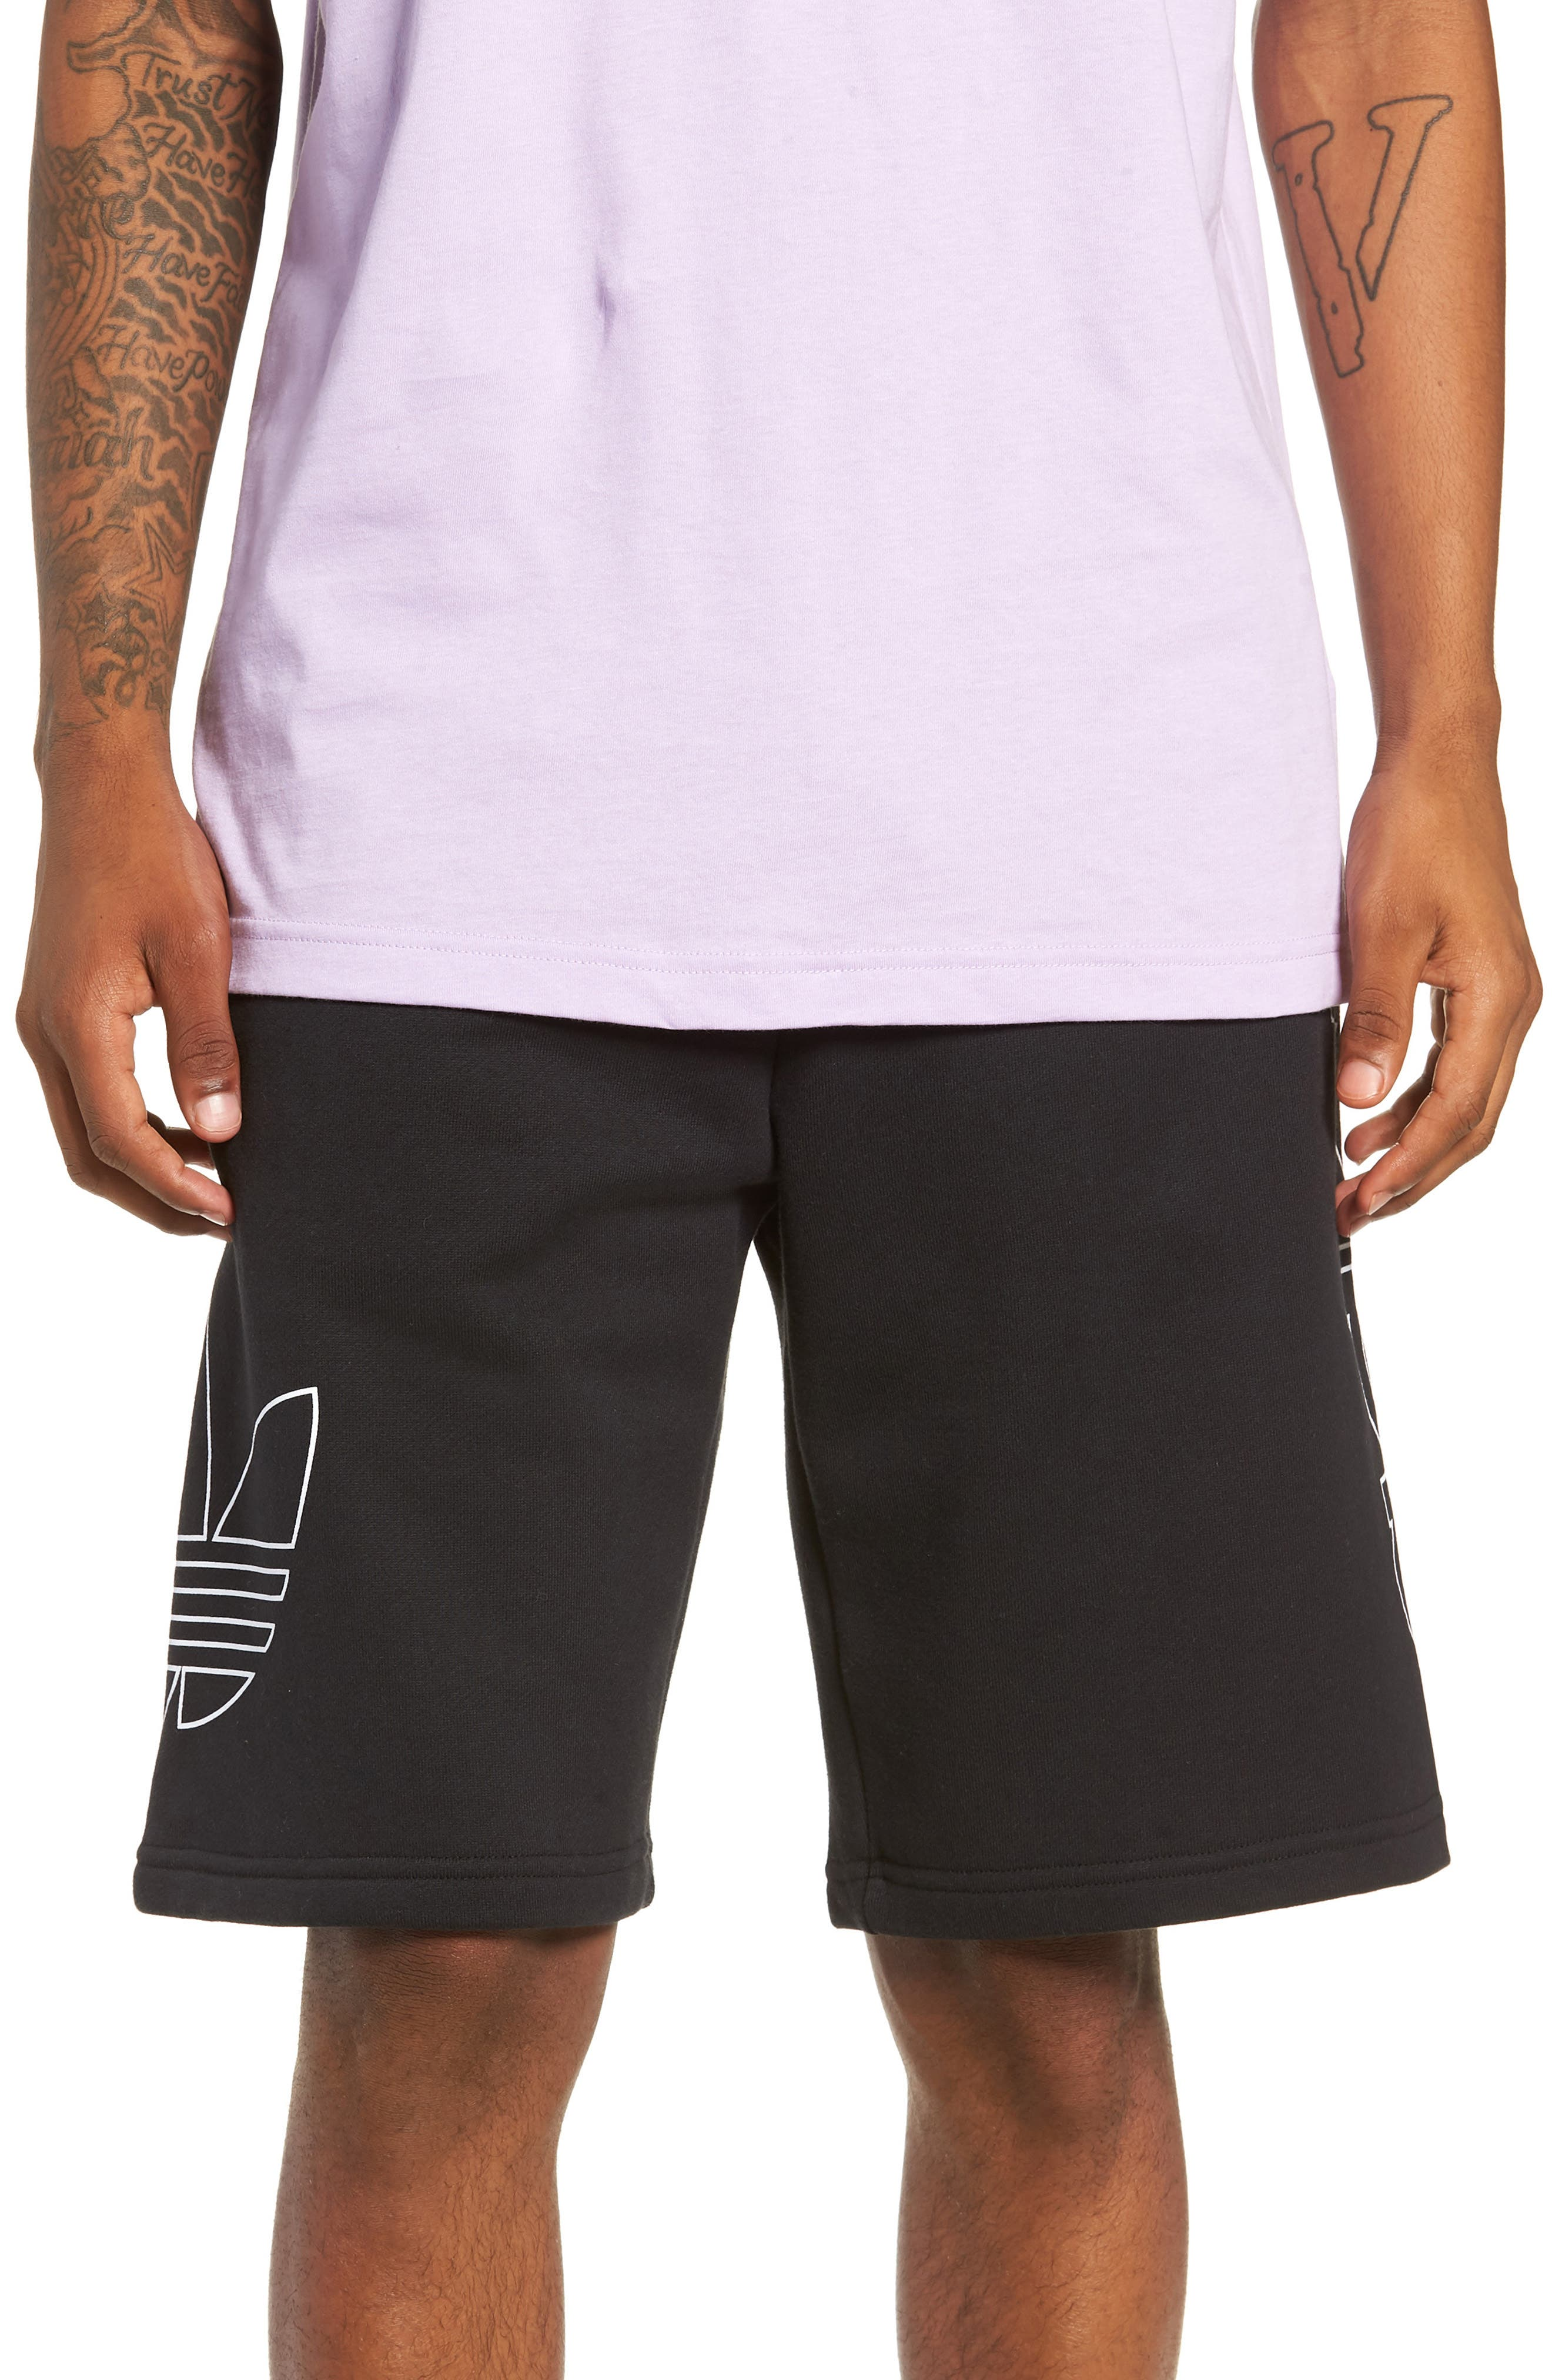 ADIDAS ORIGINALS, FT OTLN Athletic Shorts, Main thumbnail 1, color, BLACK/ WHITE